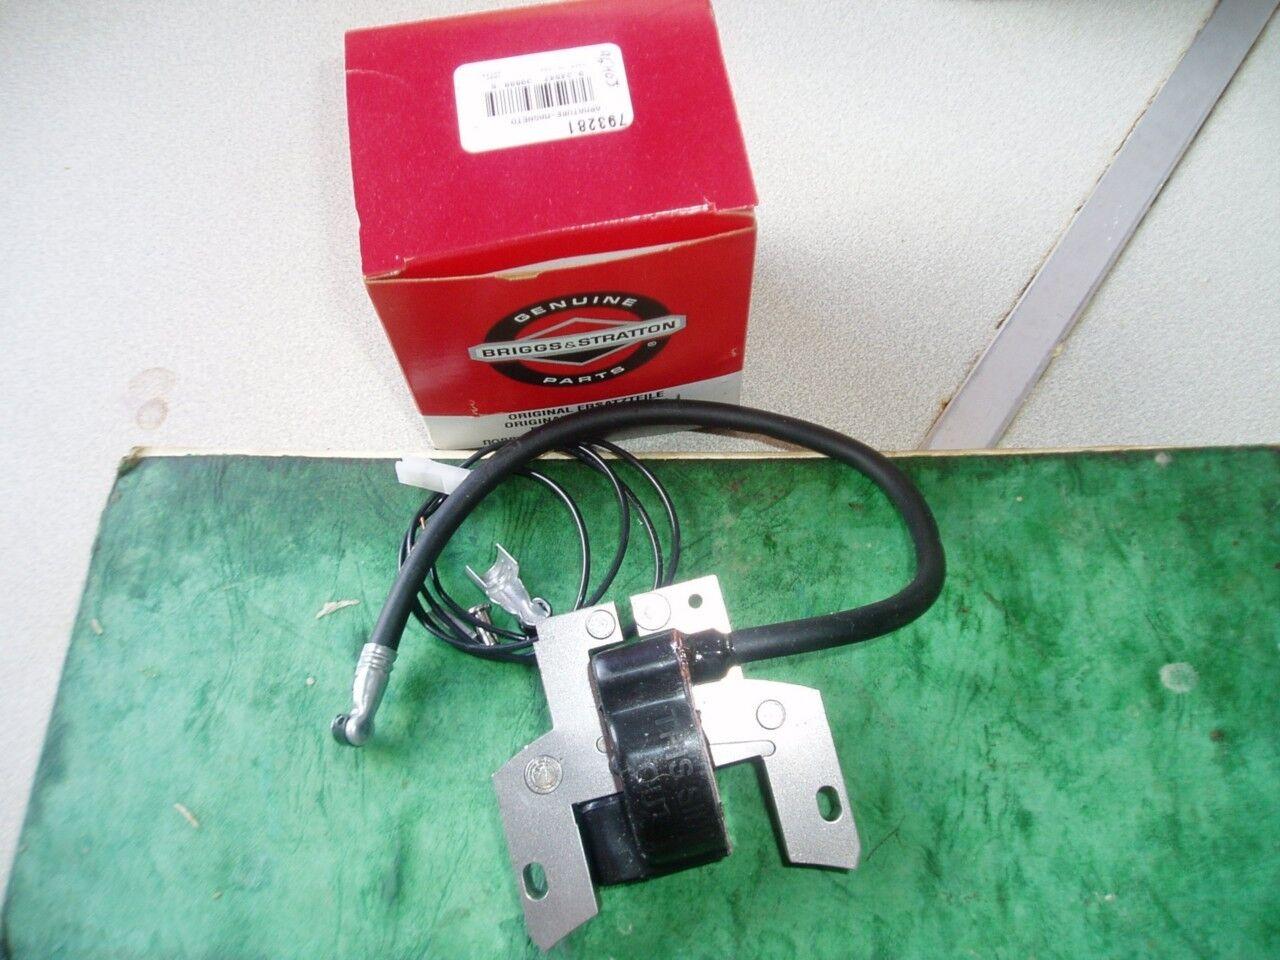 799651 Engines OEM Briggs /& Stratton 592846 Magneto Armature for 691060